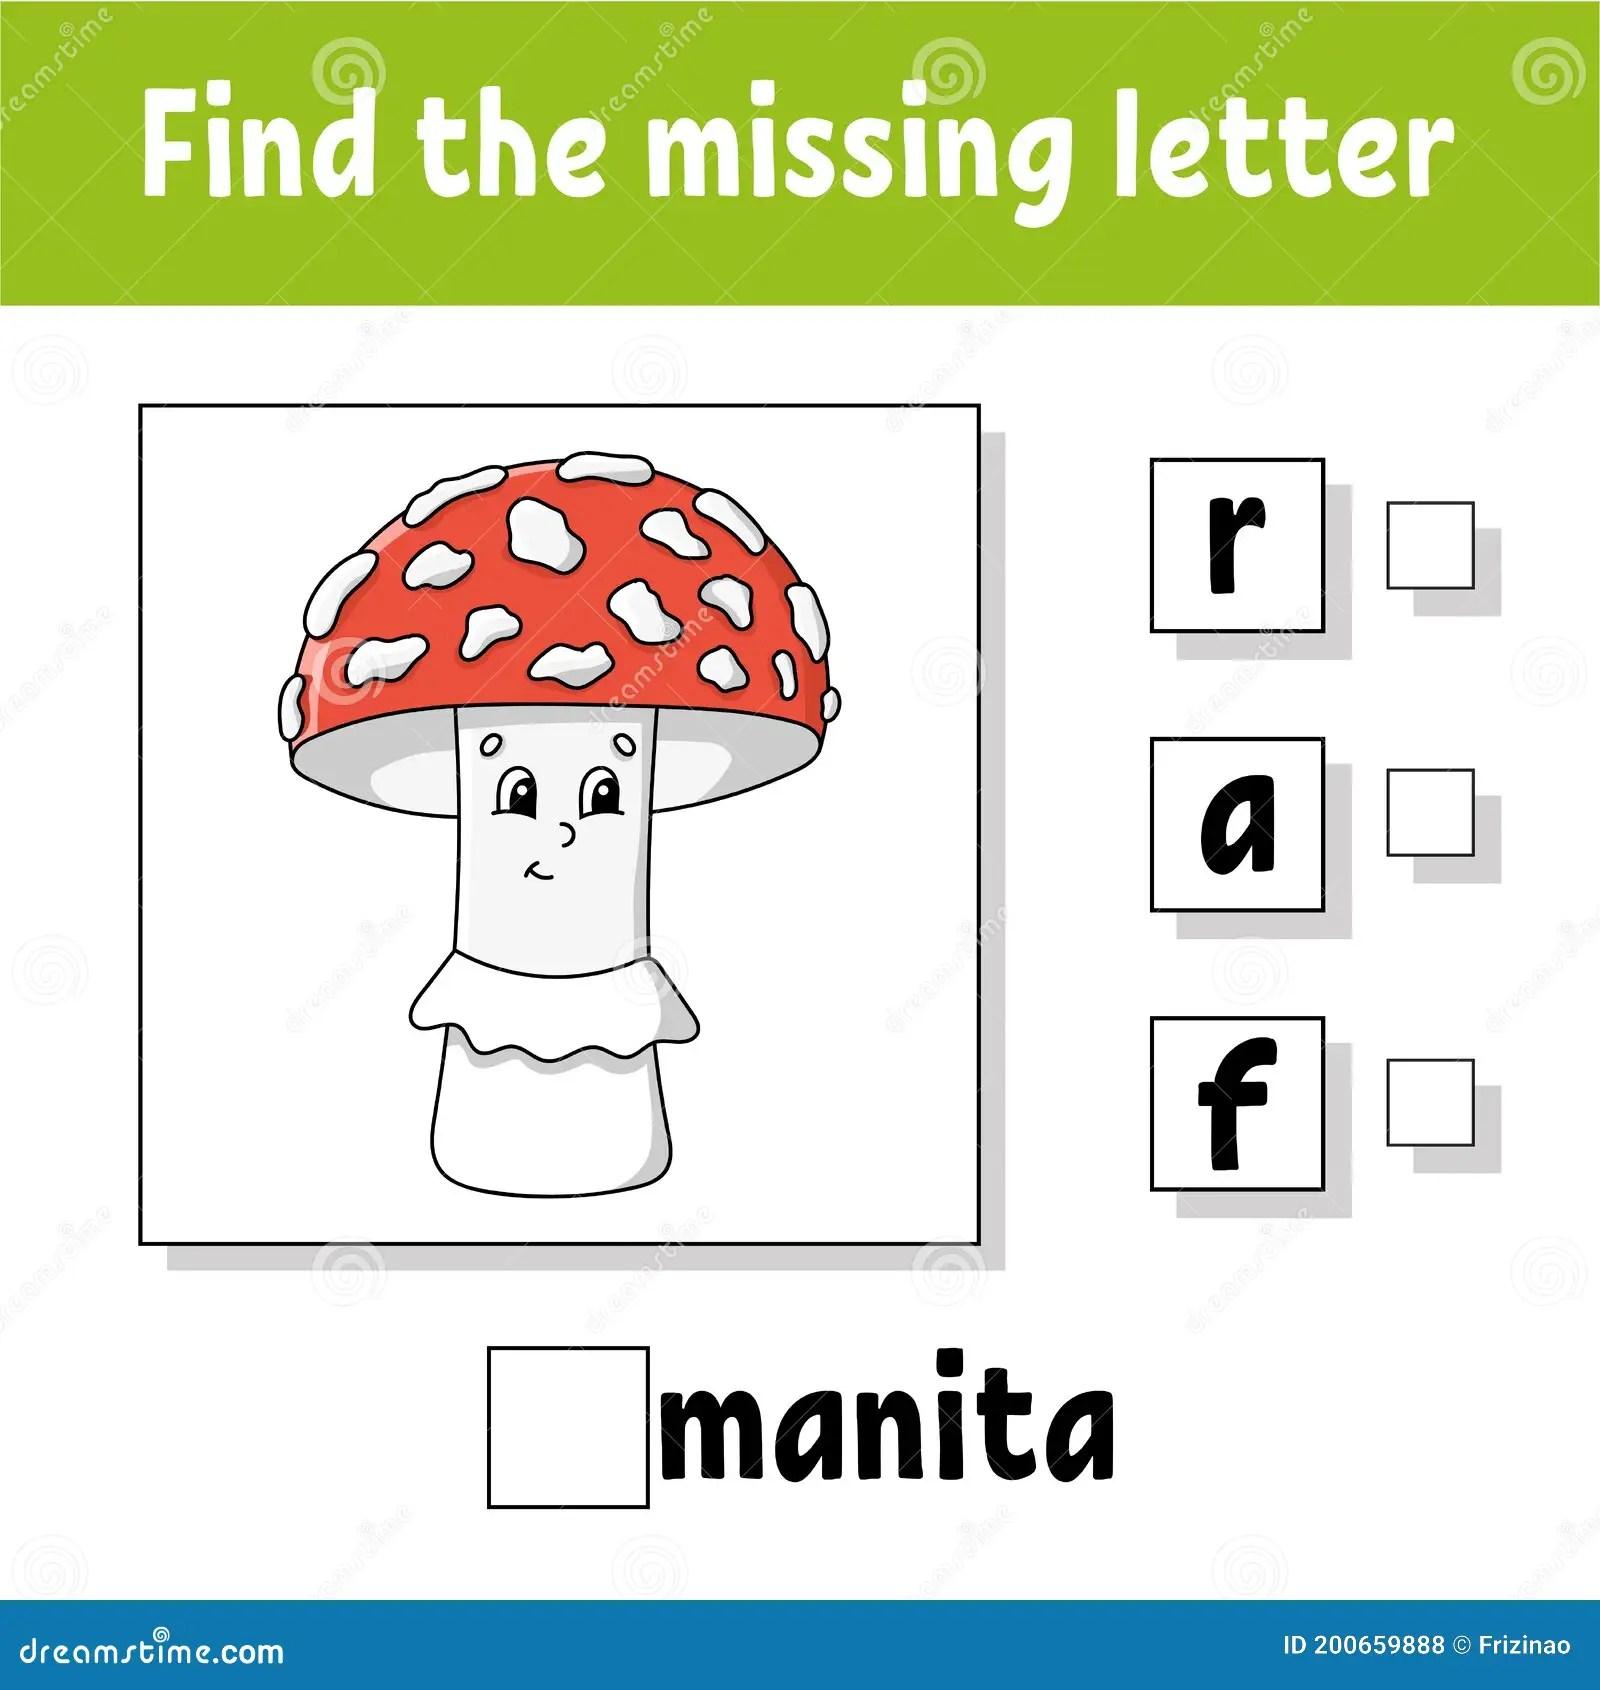 Find The Missing Letter Education Developing Worksheet